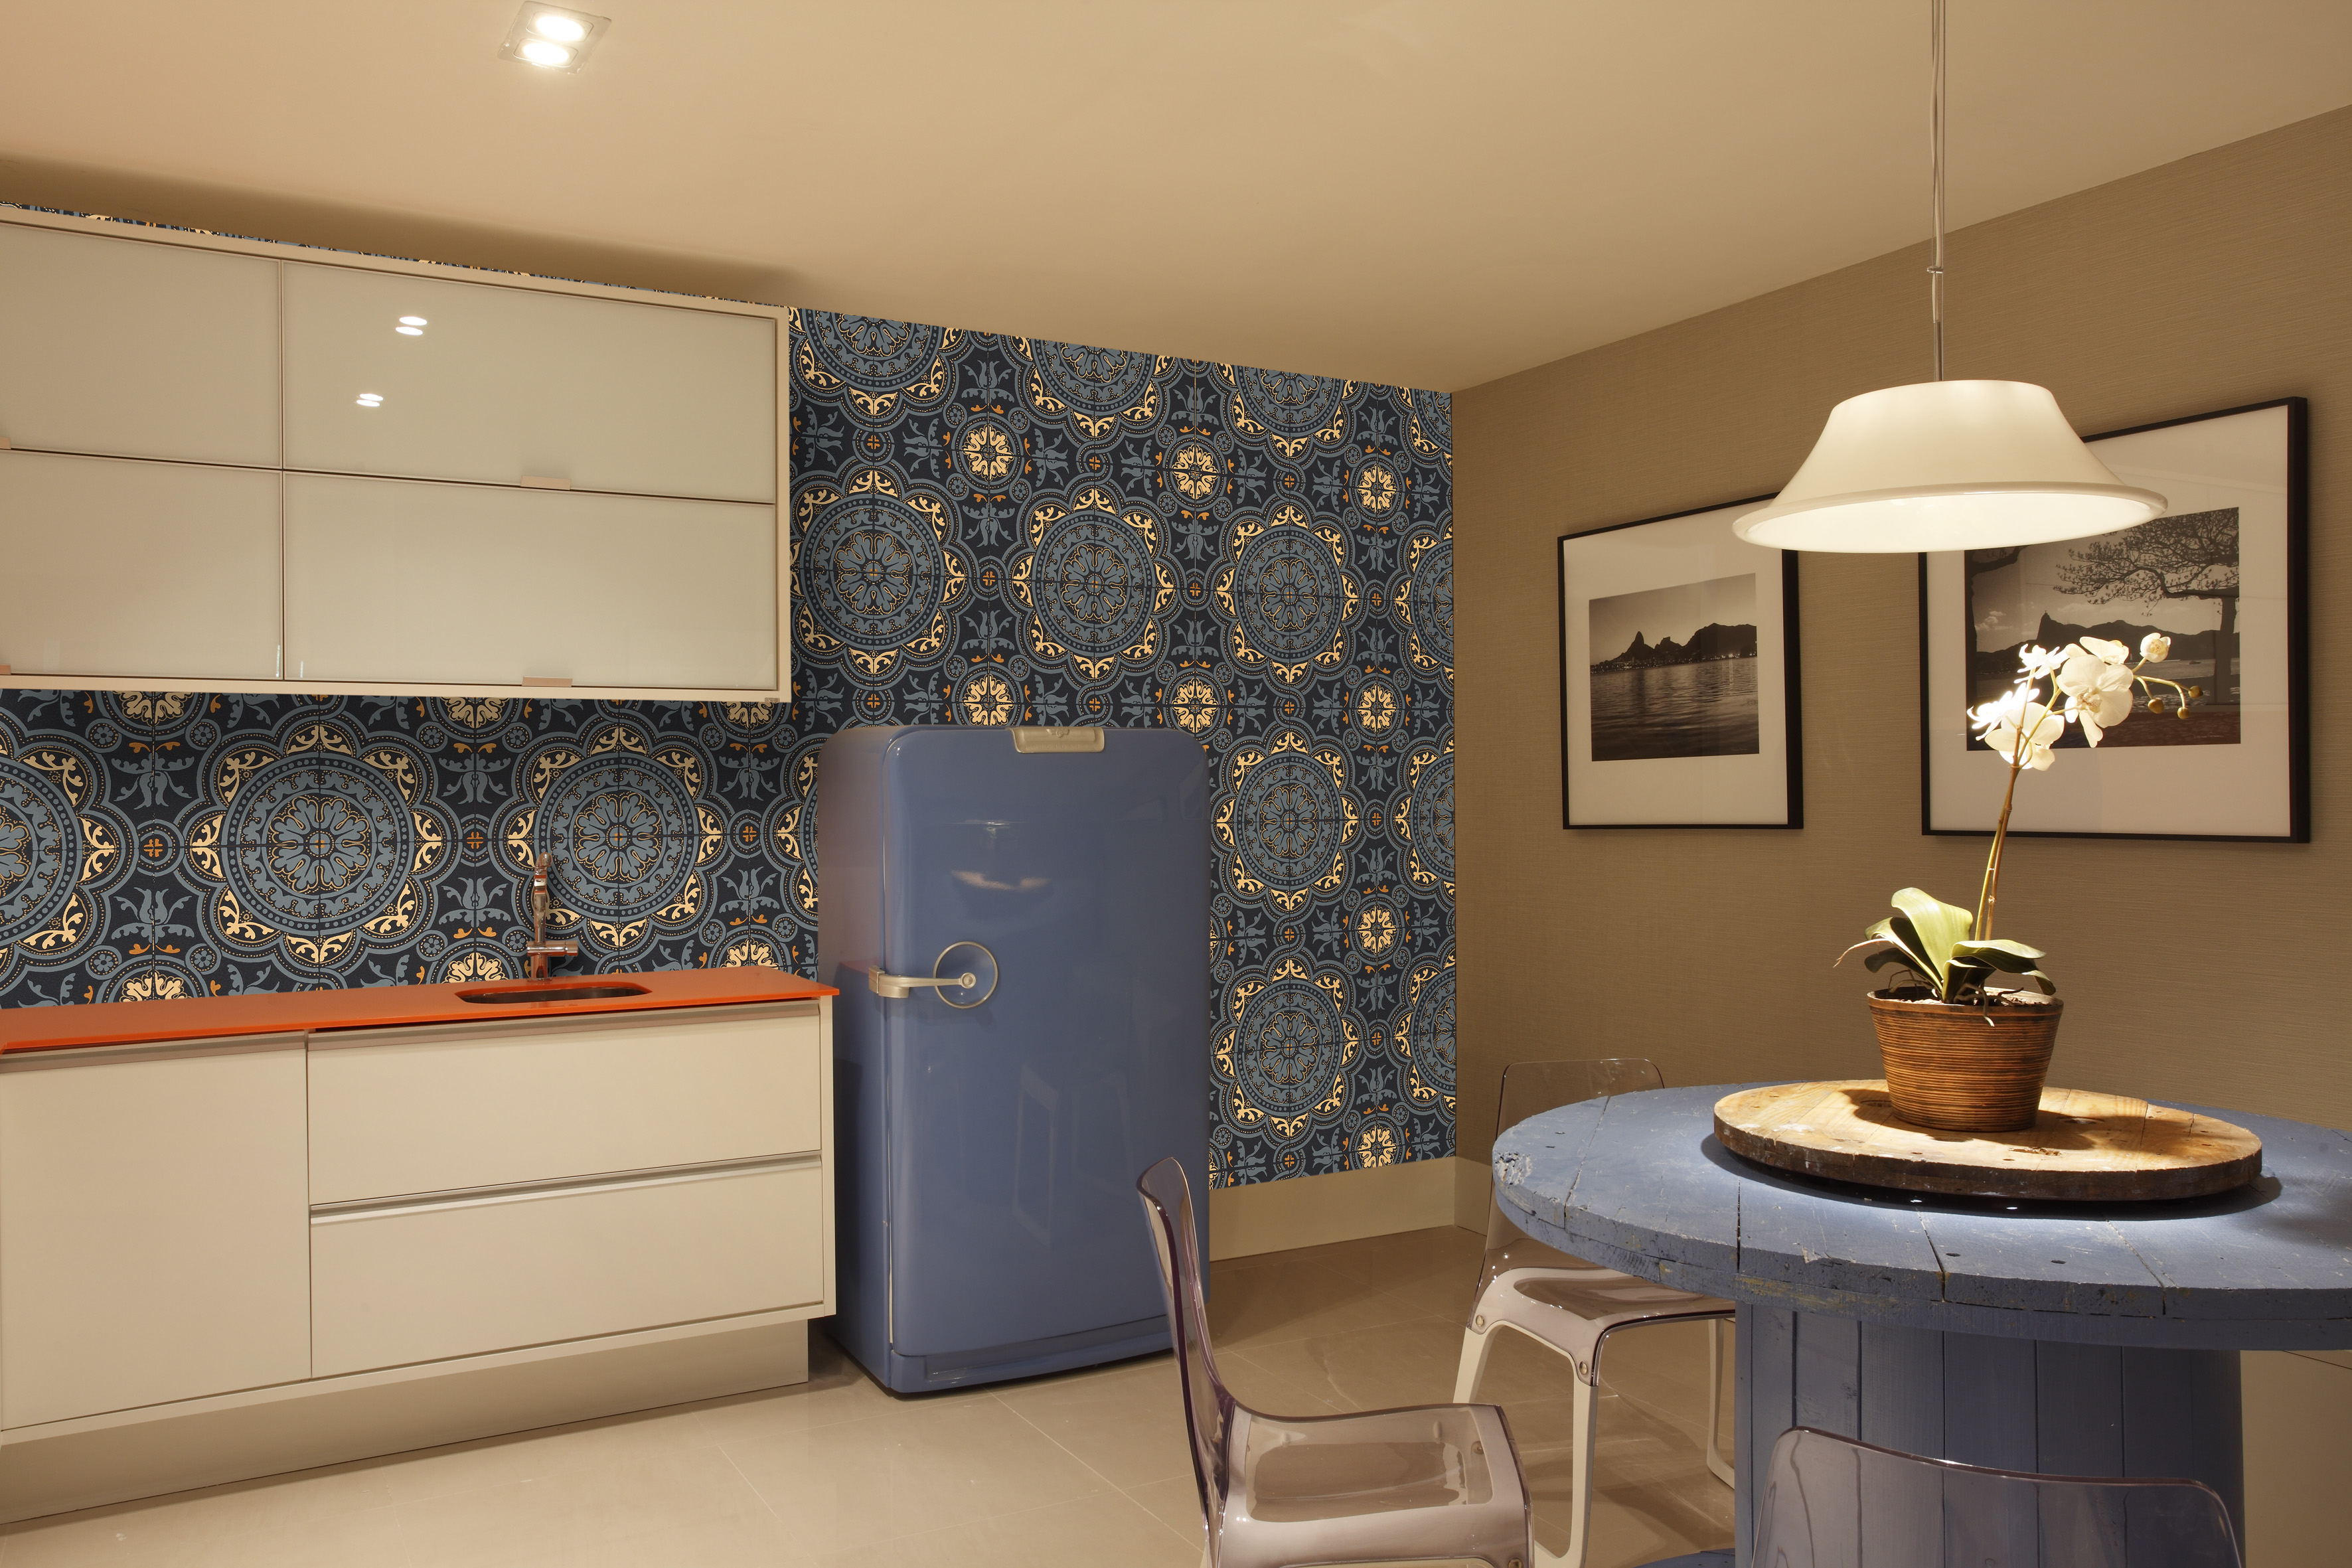 novembro de 2012 papel de parede que parece azulejo retrô #9A5731 3543 2362